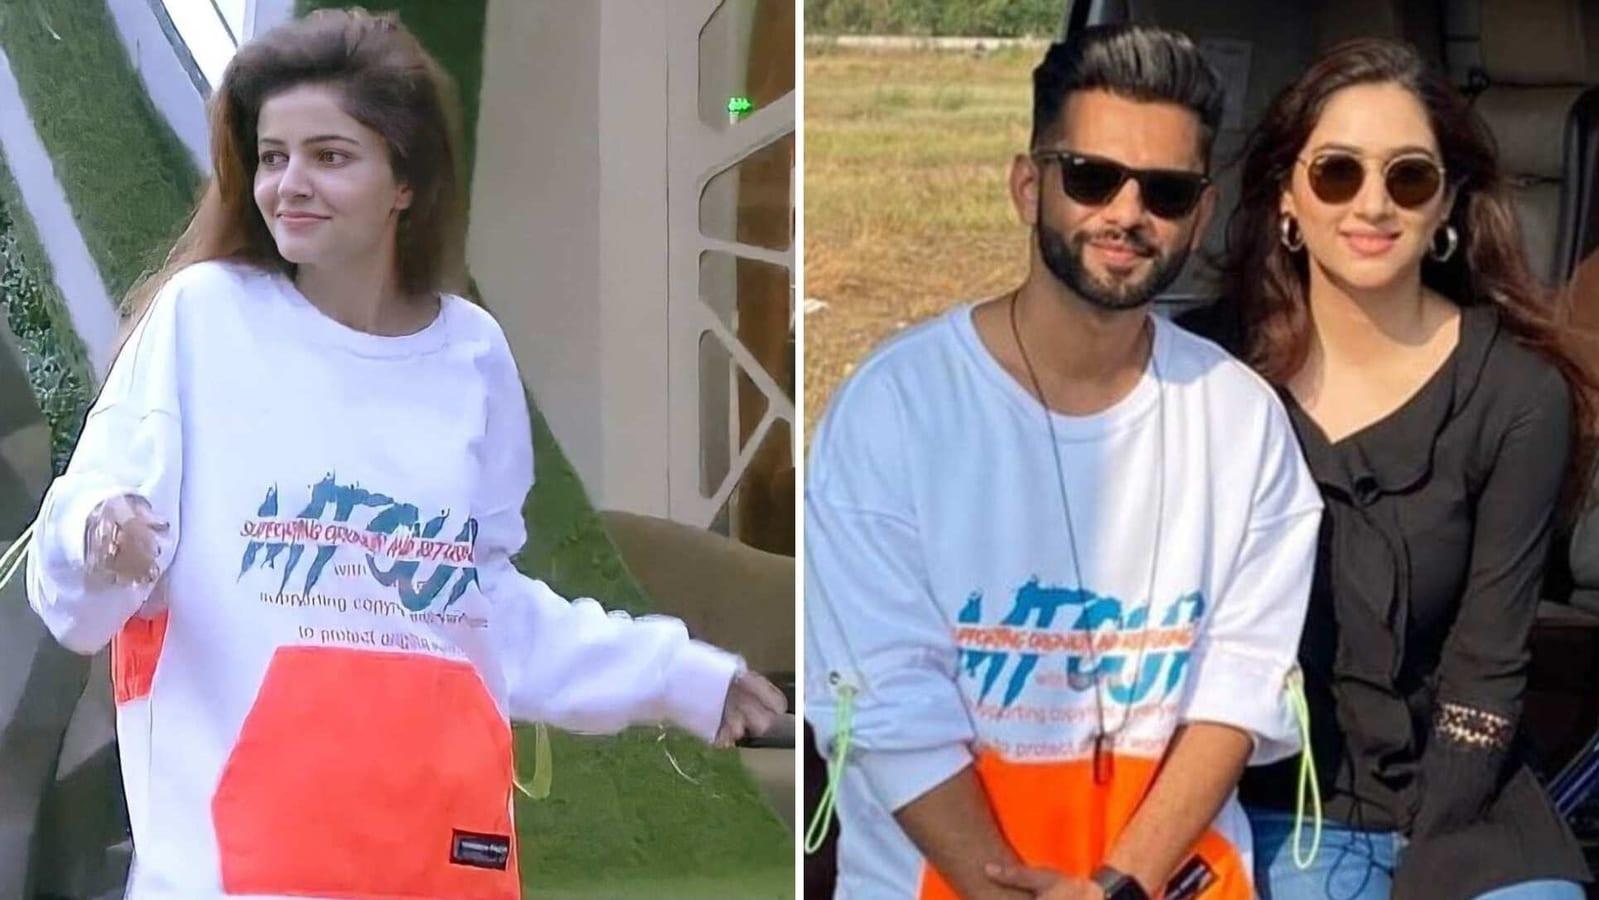 Bigg Boss 14: Rahul Vaidya takes fashion inspiration from Rubina Dilaik, Twitter asks 'udhaar li hai ya churaai hai?' - Hindustan Times